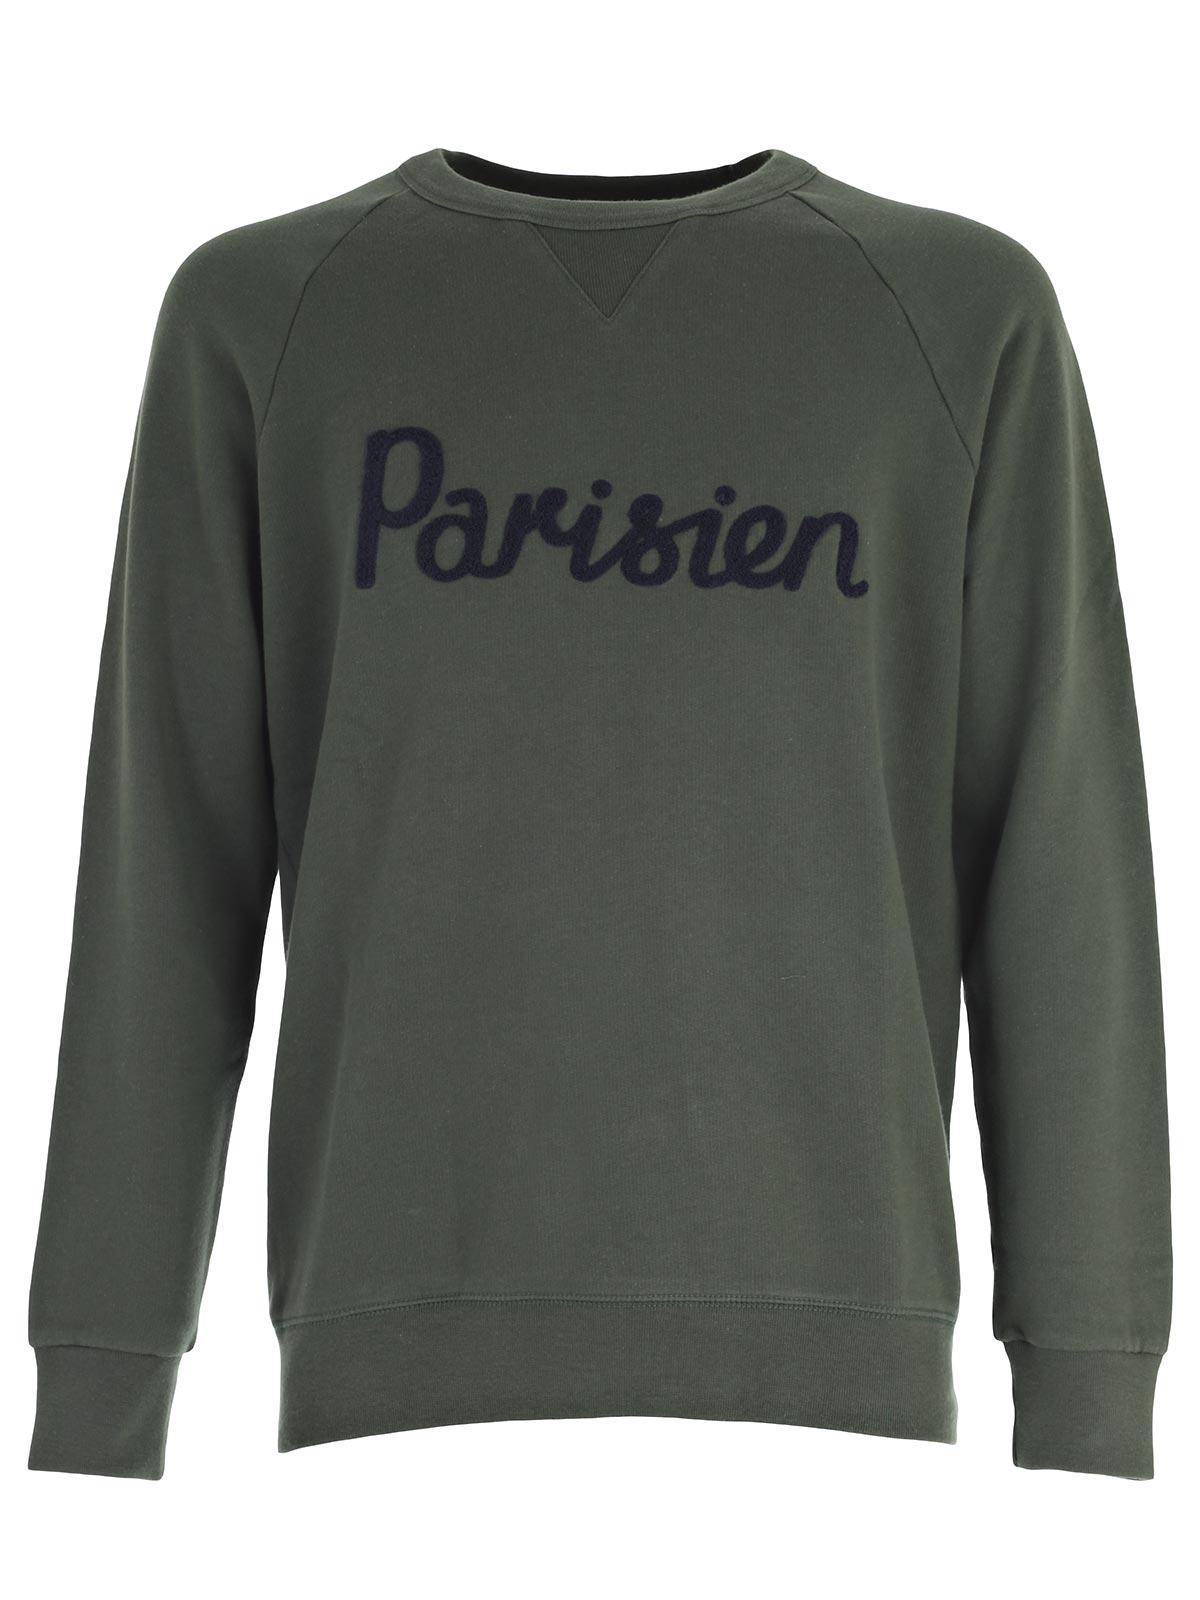 Picture of MAISON KITSUNE SweatShirt FELPA PARISIEN GIROCOLLO